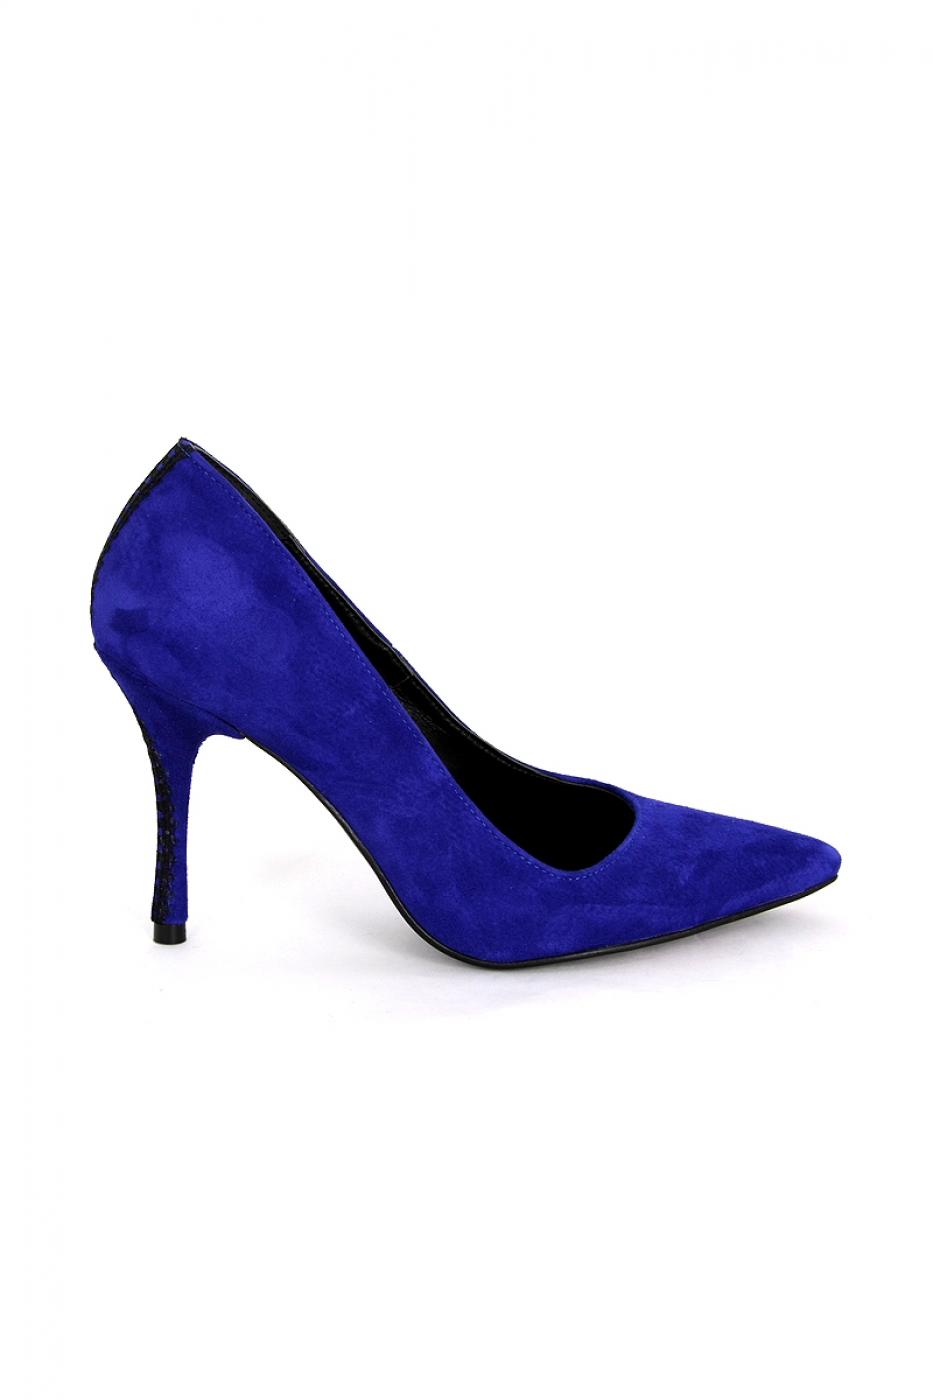 pantofi-cu-toc-cui-si-bot-ascutit-albastru-ultramarin-mihaela-glavan-~-exclusiv!__mglavan_ex07_extra